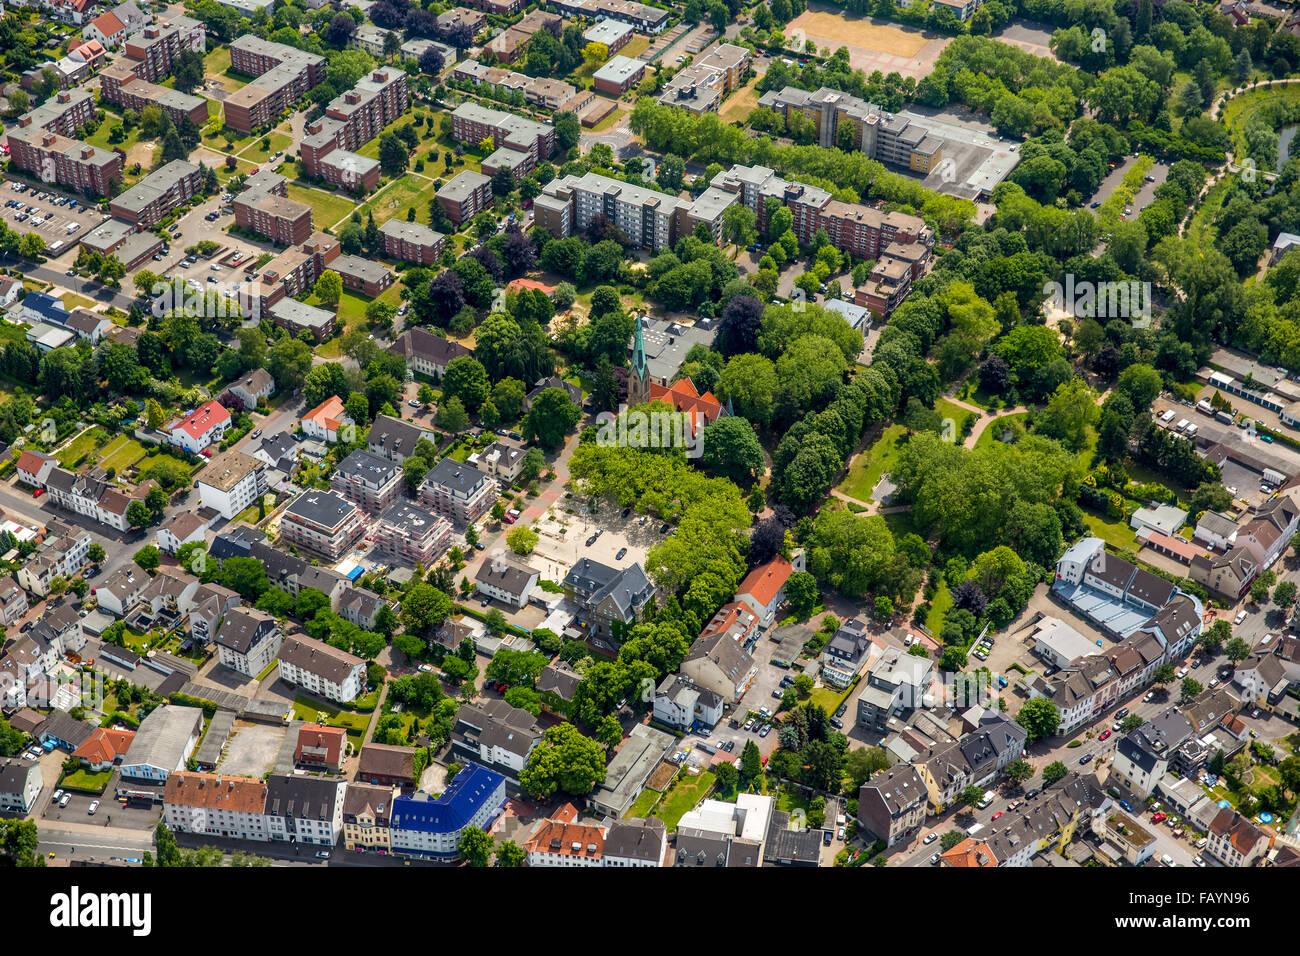 Aerial view, Holzwickede, Ruhr area, North Rhine-Westphalia, Germany, Europe, Aerial view, birds-eyes view, aerial - Stock Image